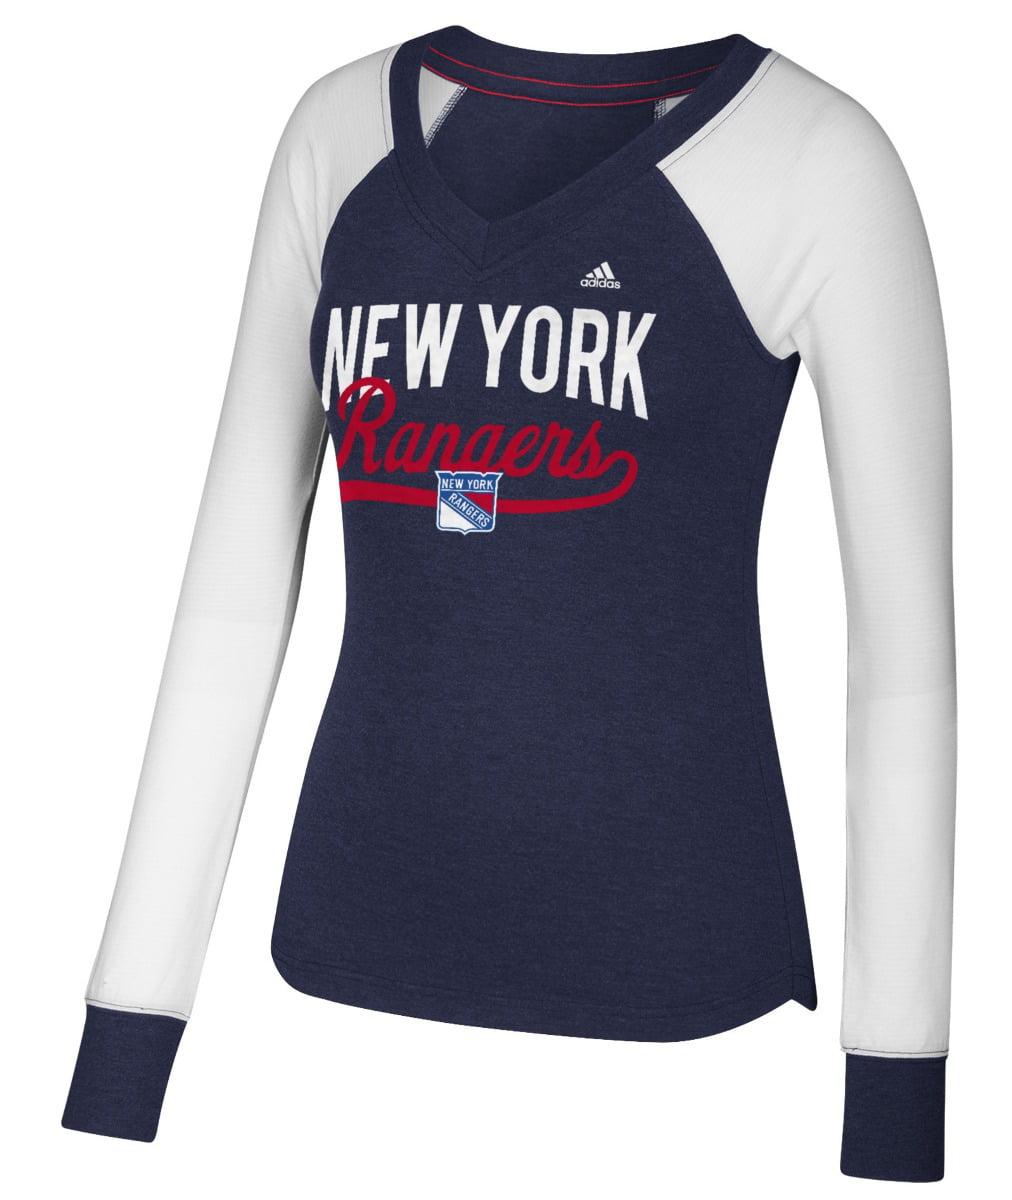 "New York Rangers Women's Adidas NHL ""Puck Drop"" Dual Blend Long Sleeve T-shirt by Adidas"